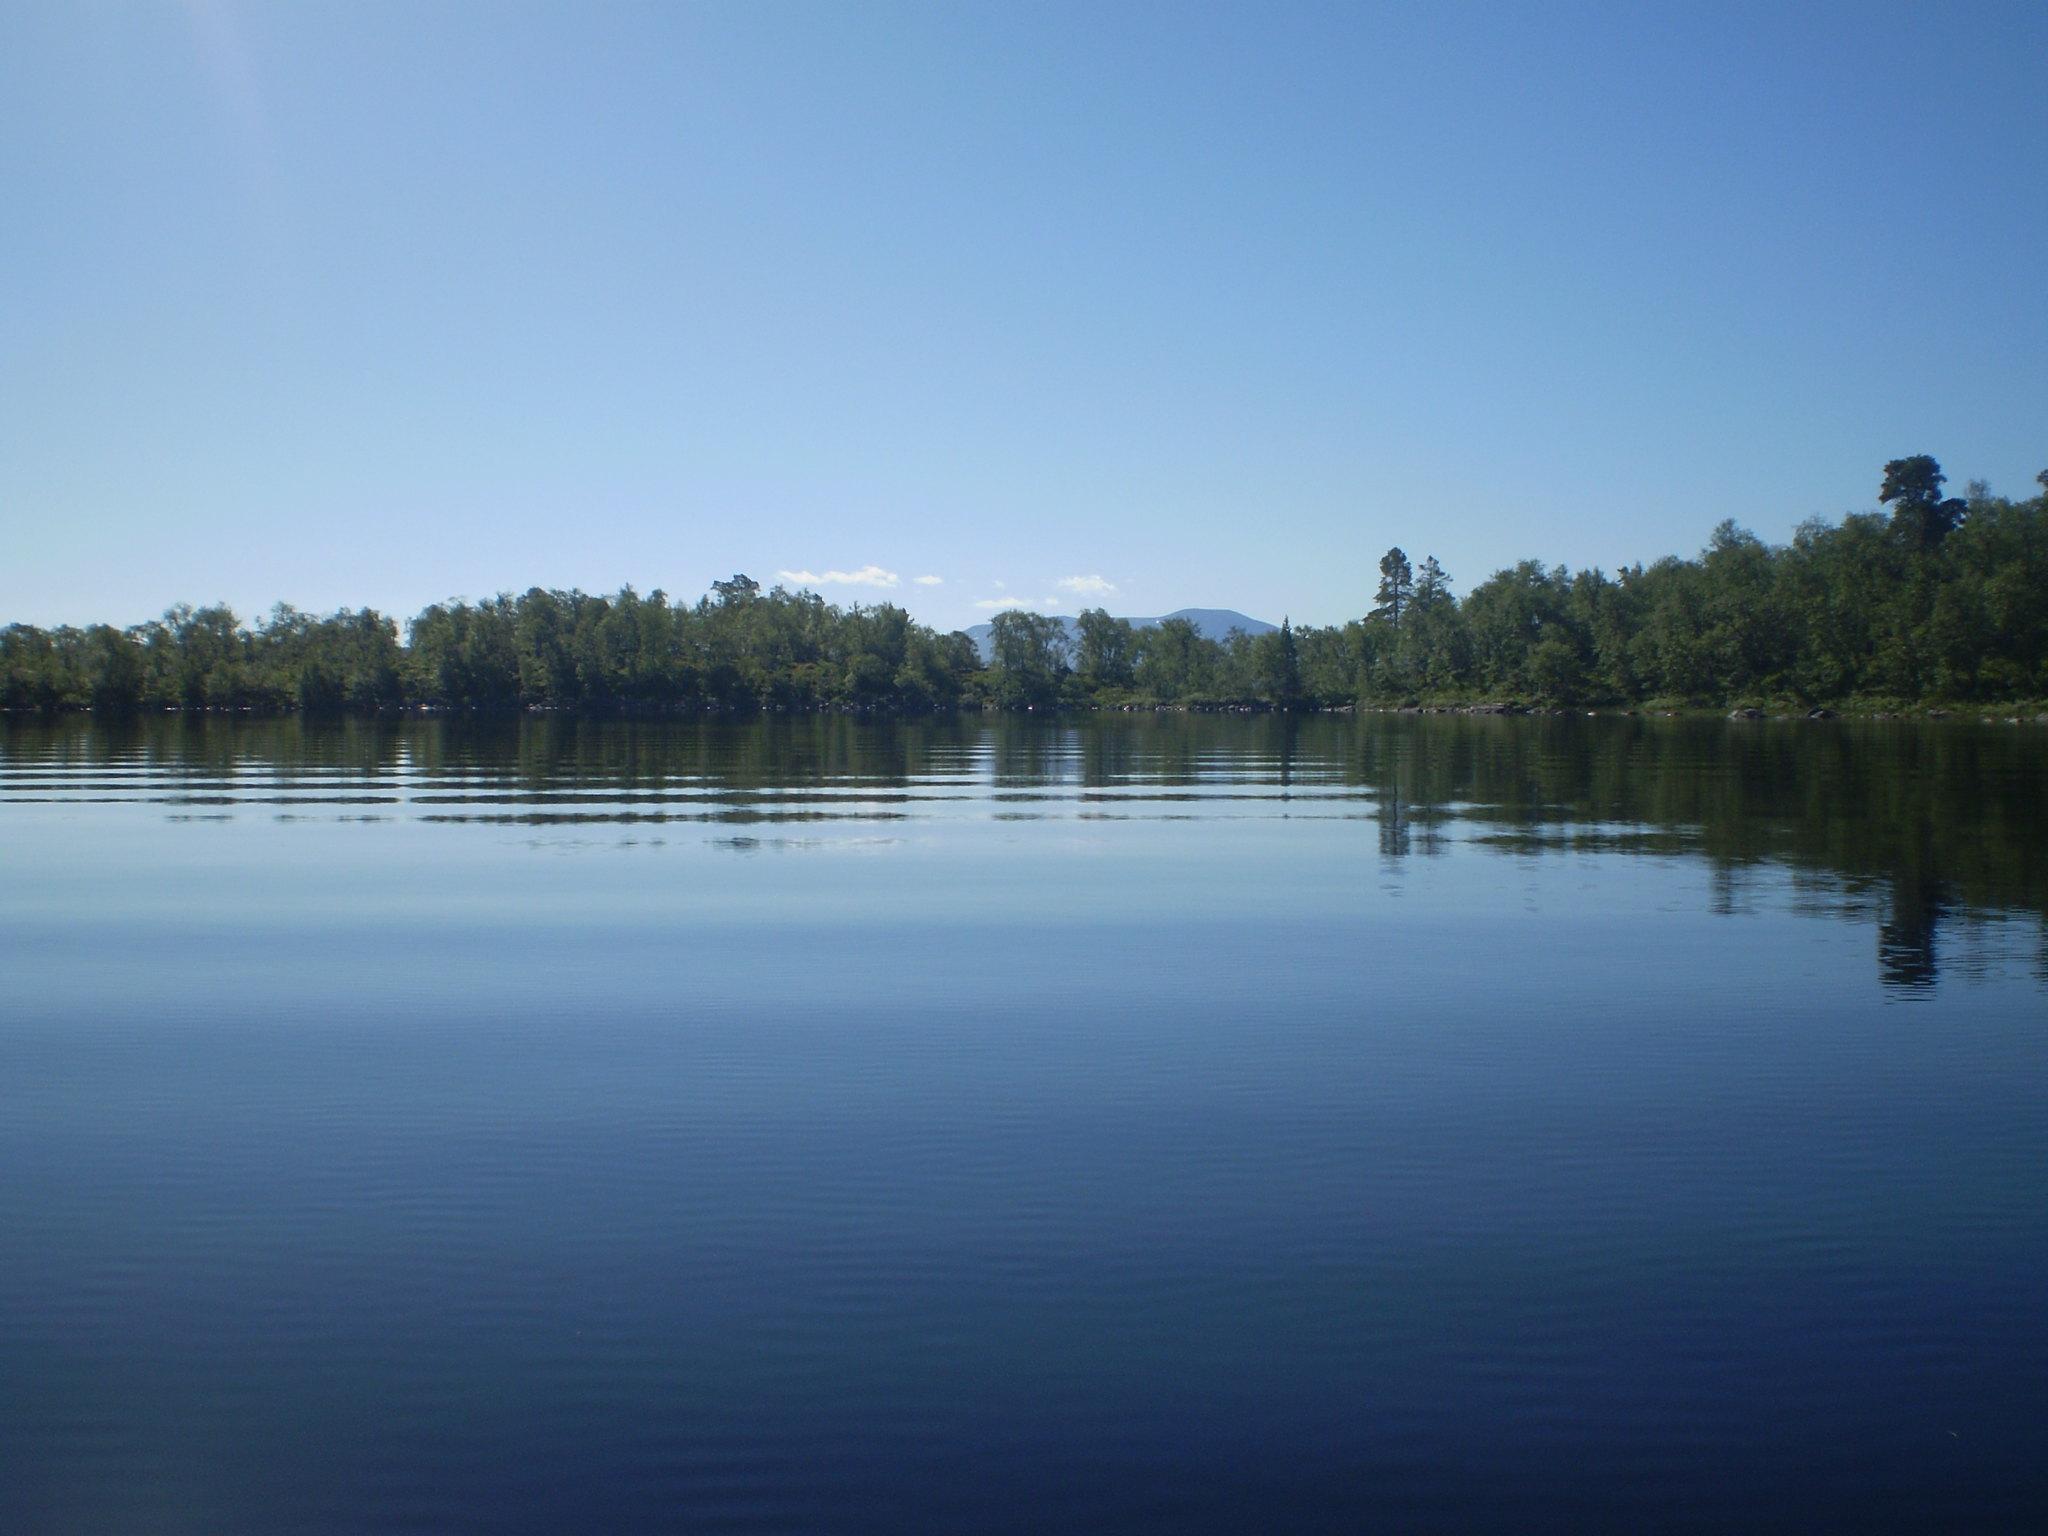 Best Lake of Norway-Femunden